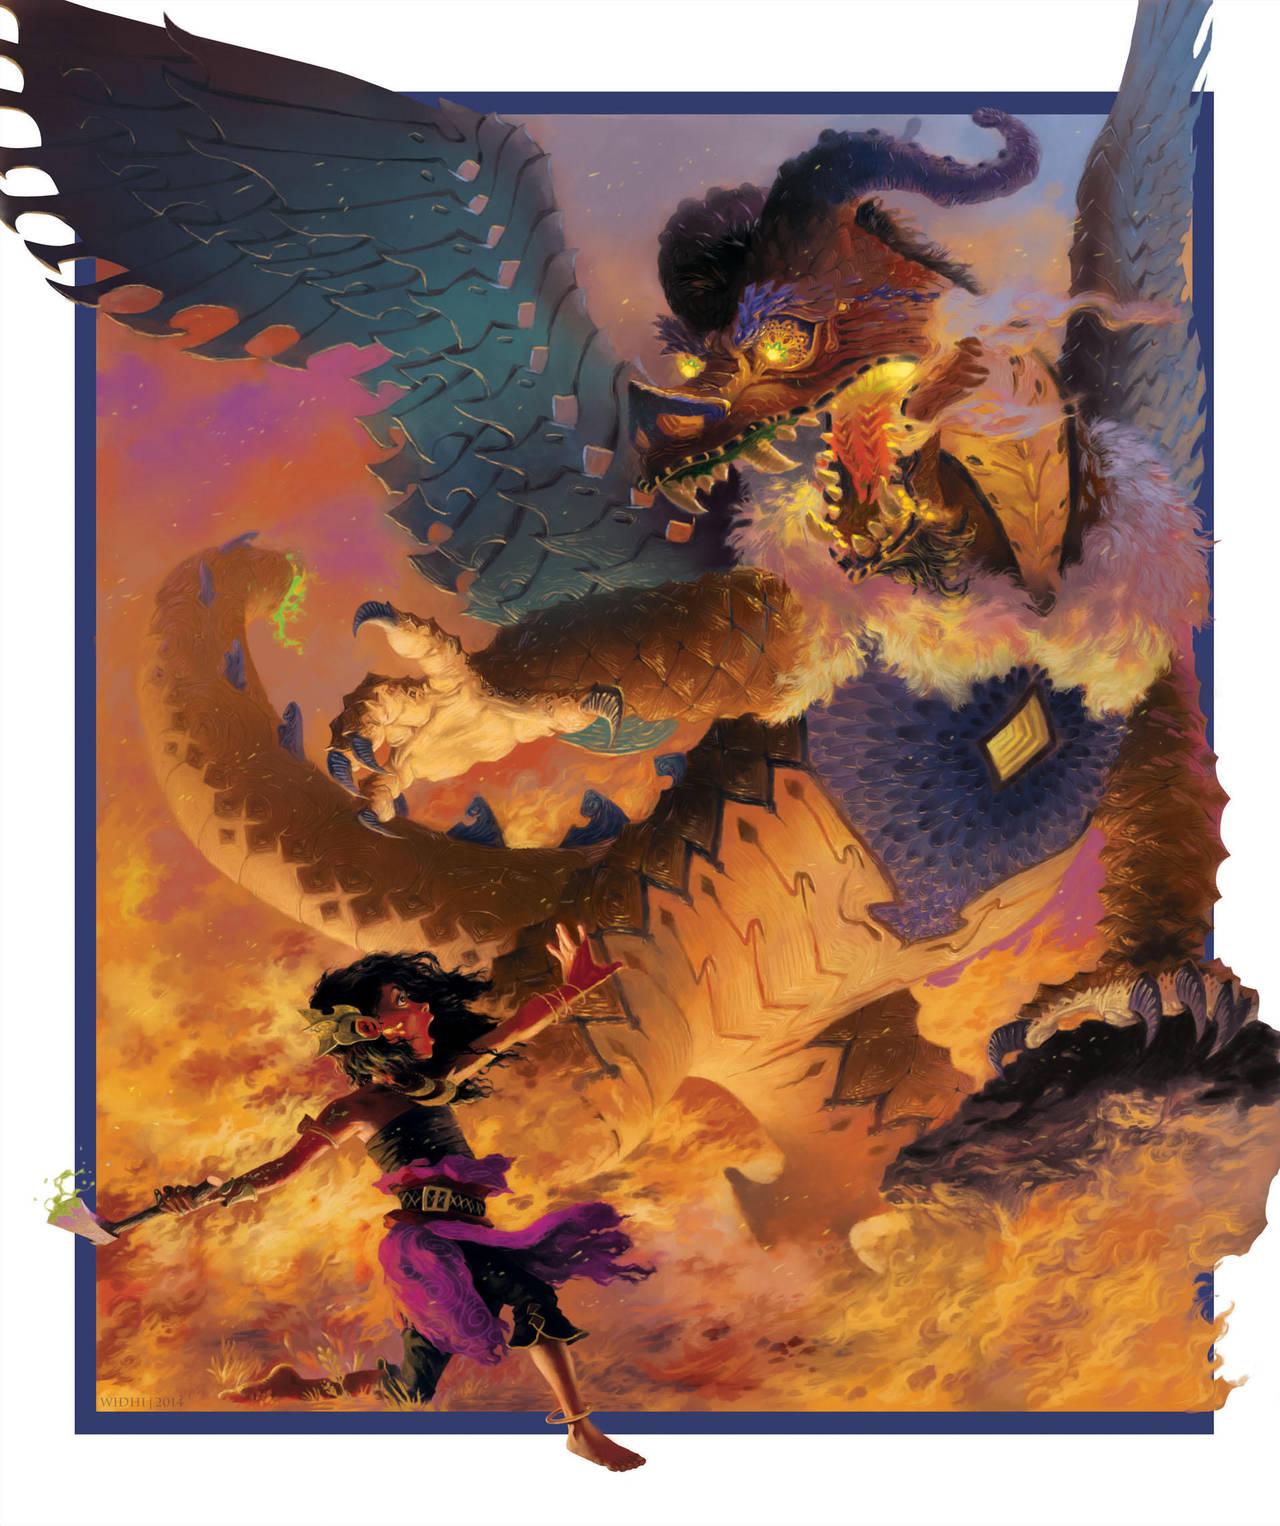 Amanda and the Dragon by Widhi